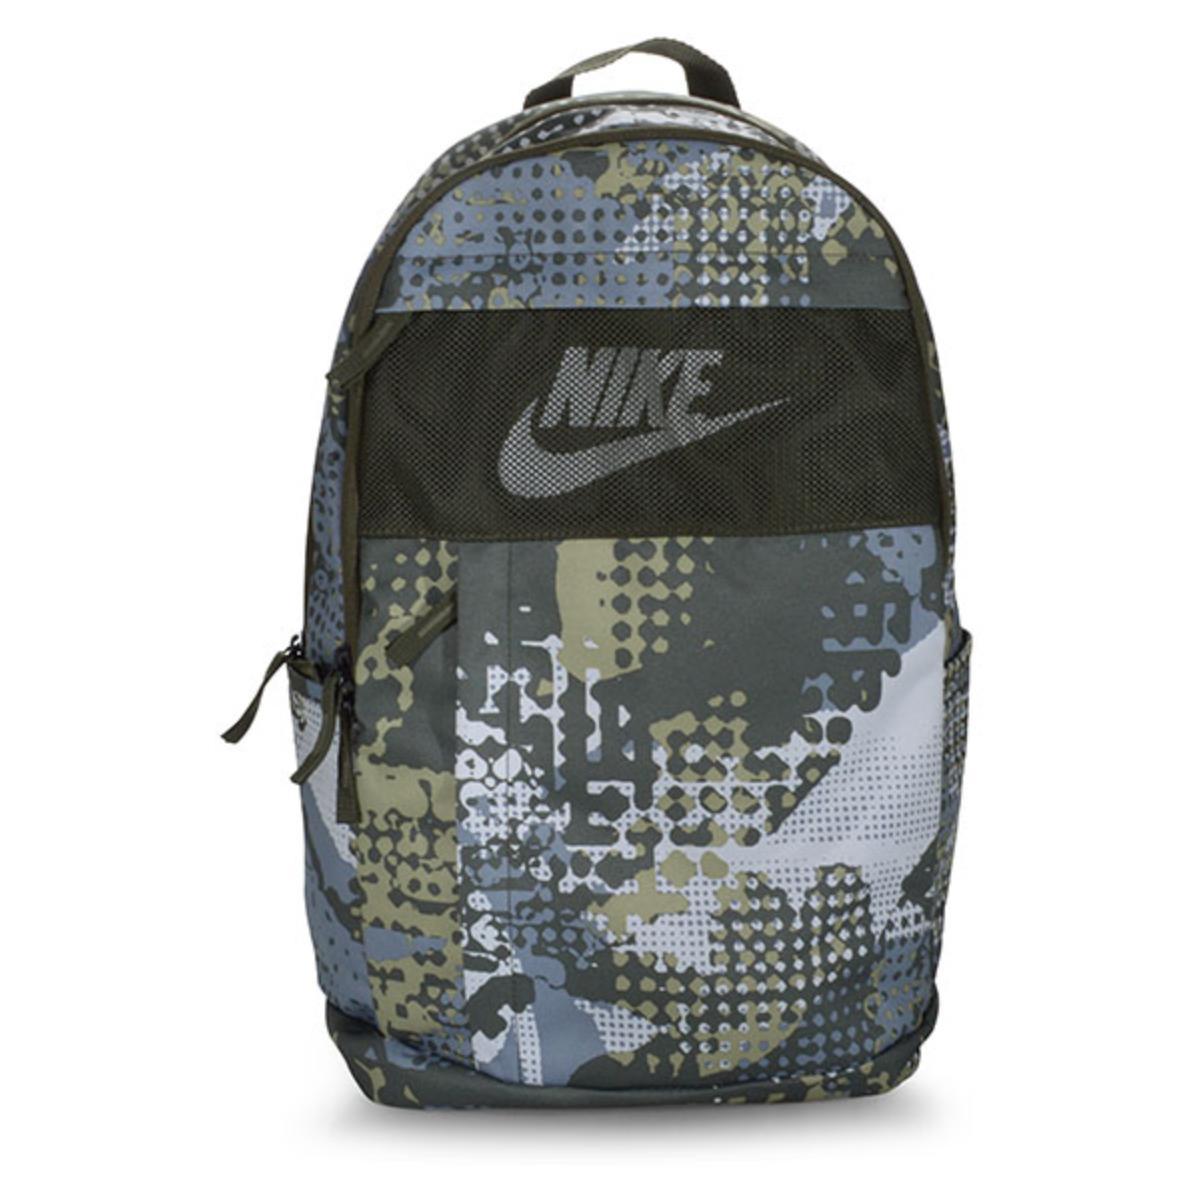 Mochila Feminina Nike Ck7922-325 nk Elmntl 2.0 Verde/branco